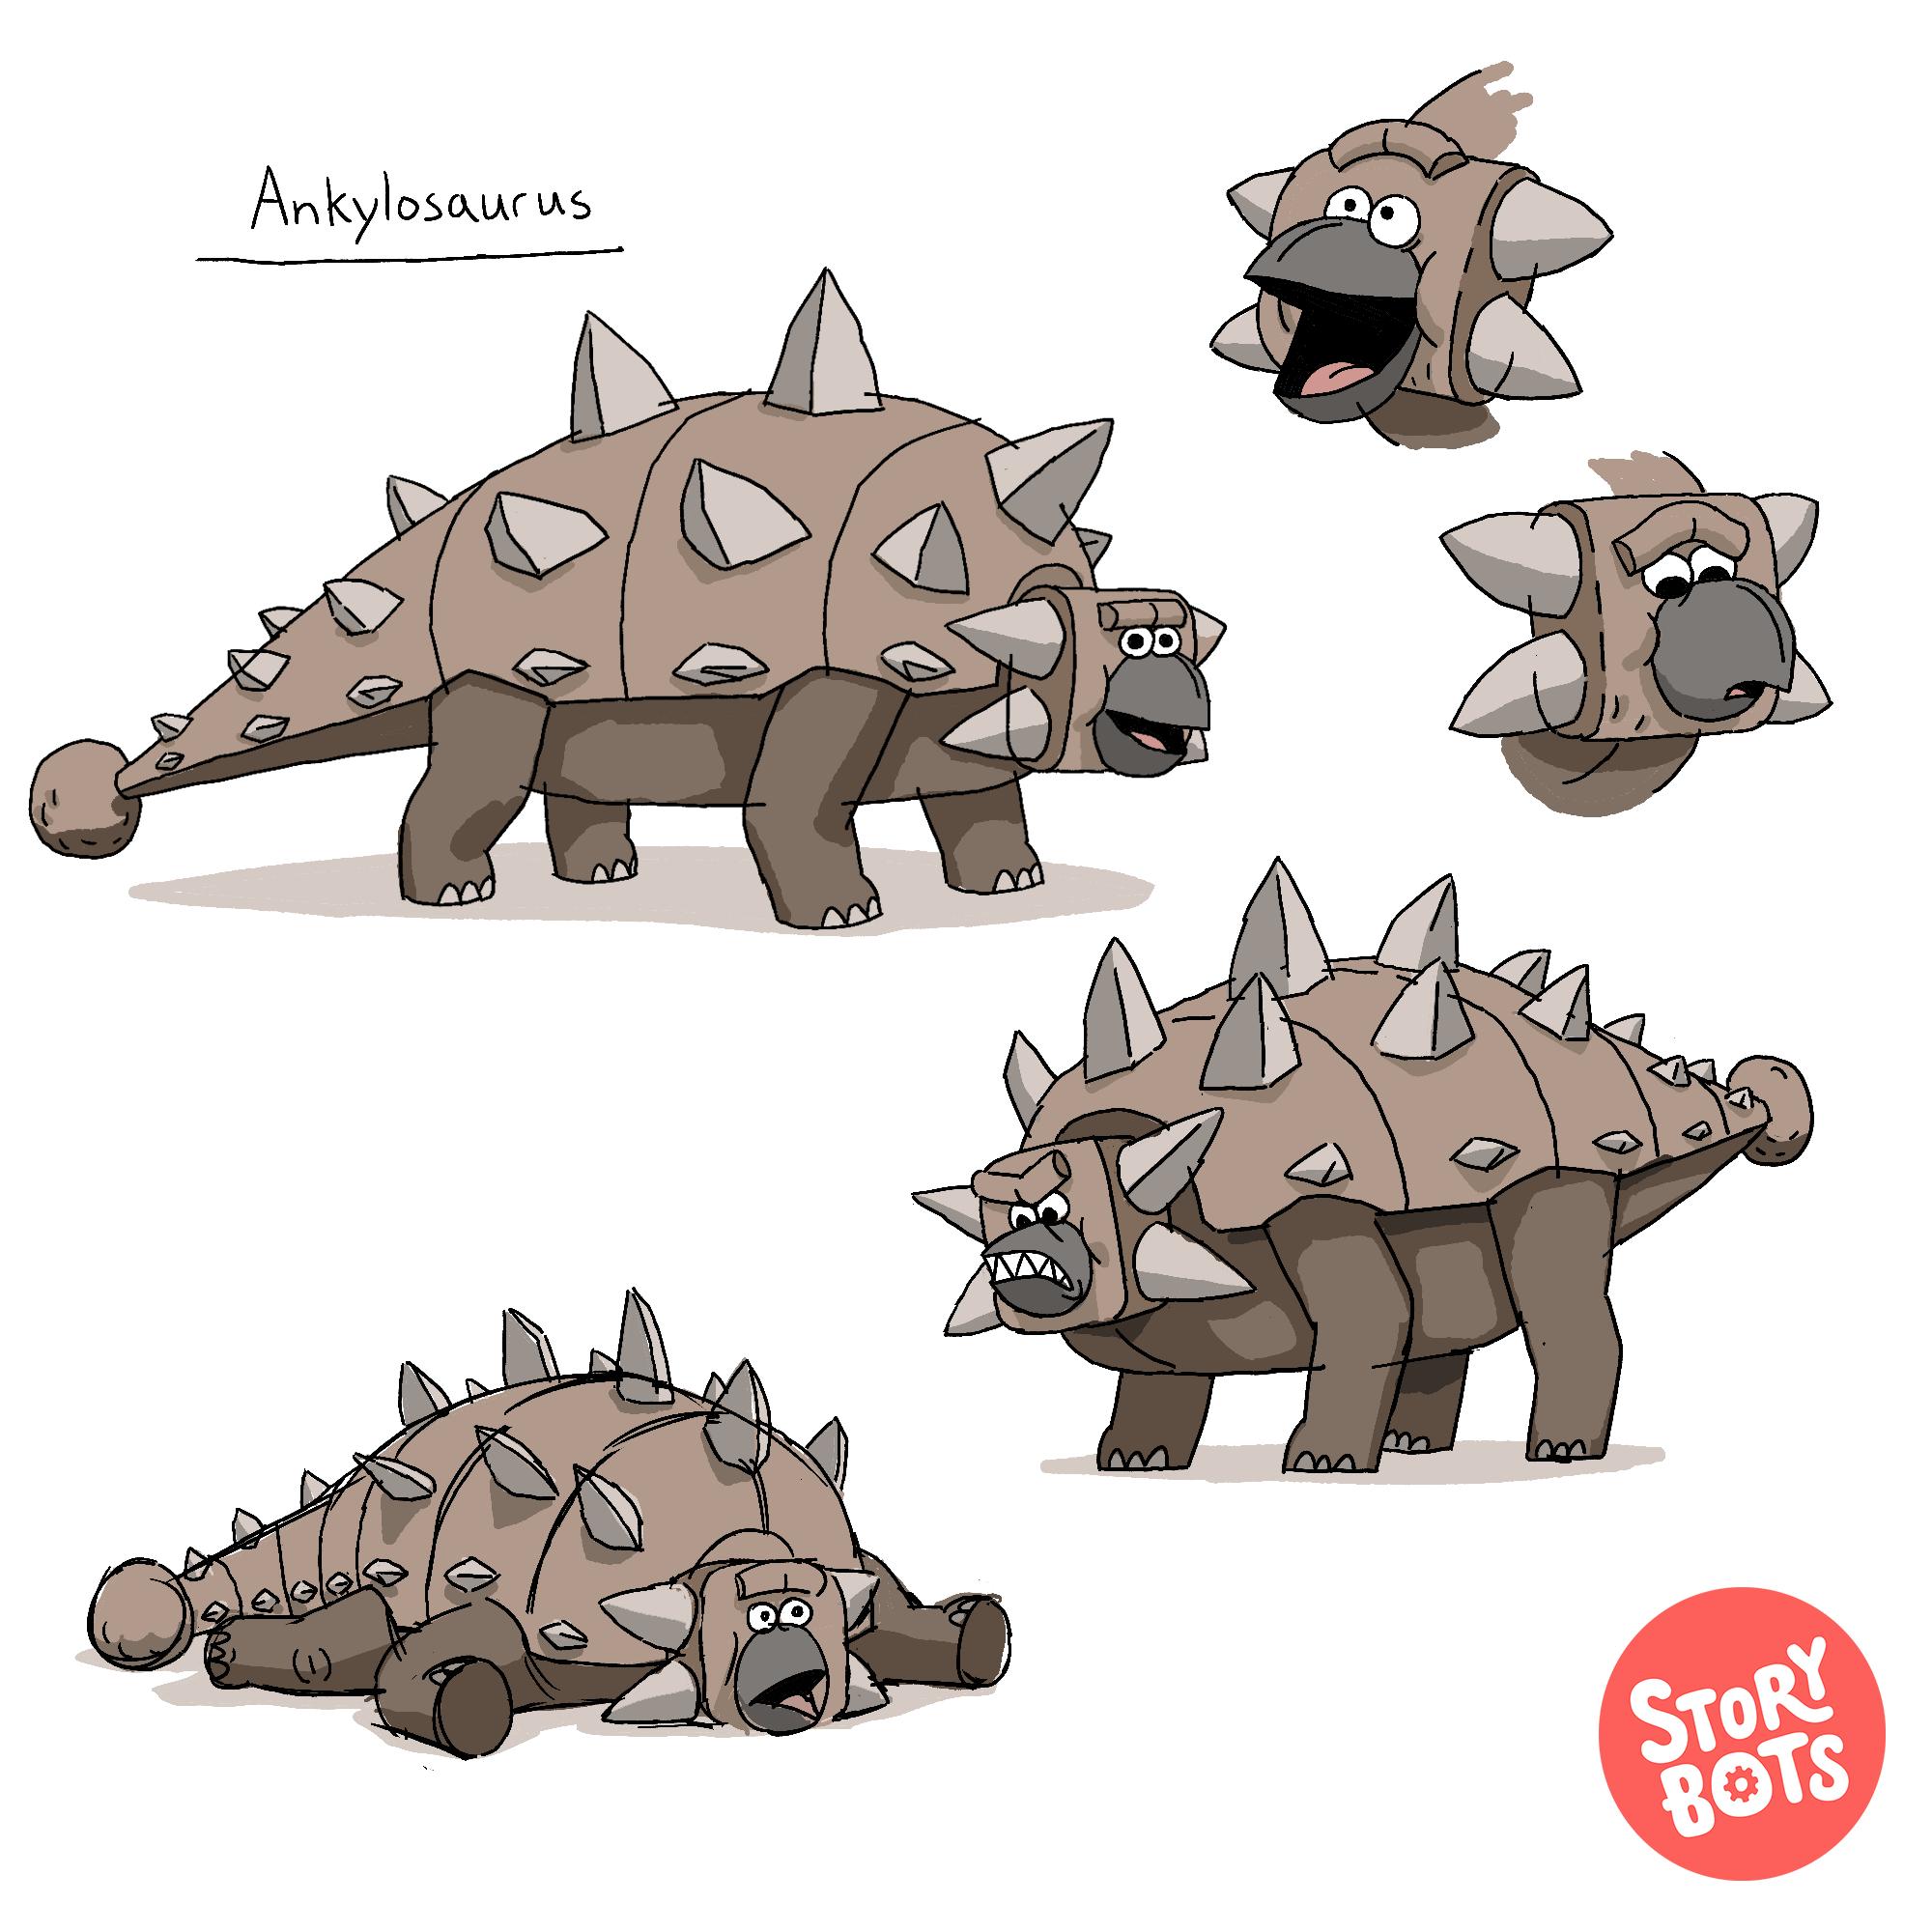 Ankylosaurus1.png